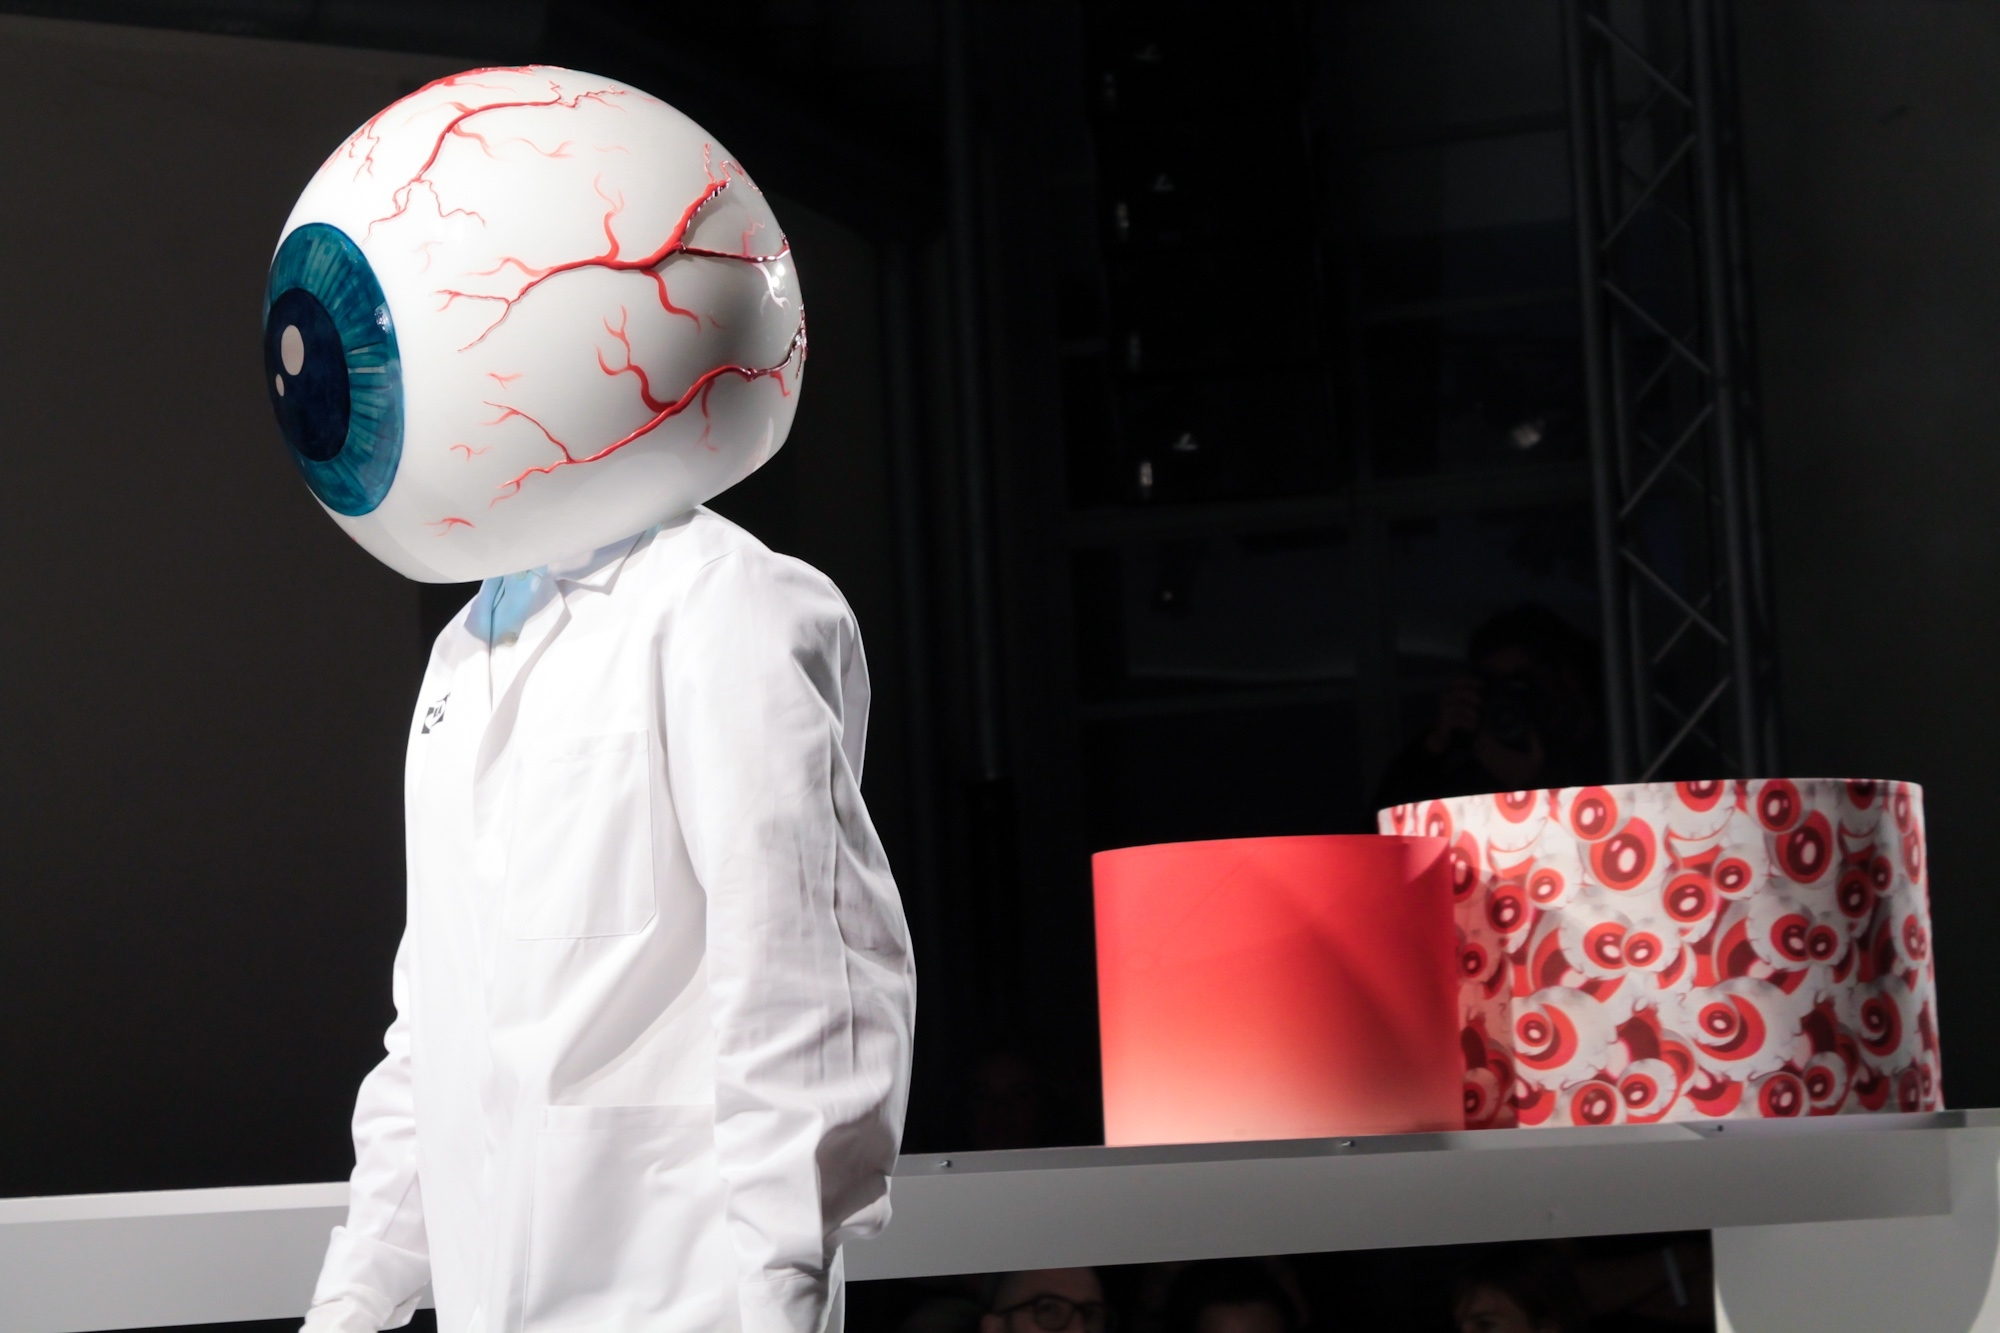 Ikea Ufficio Stampa : Ikeafashion perche? i d